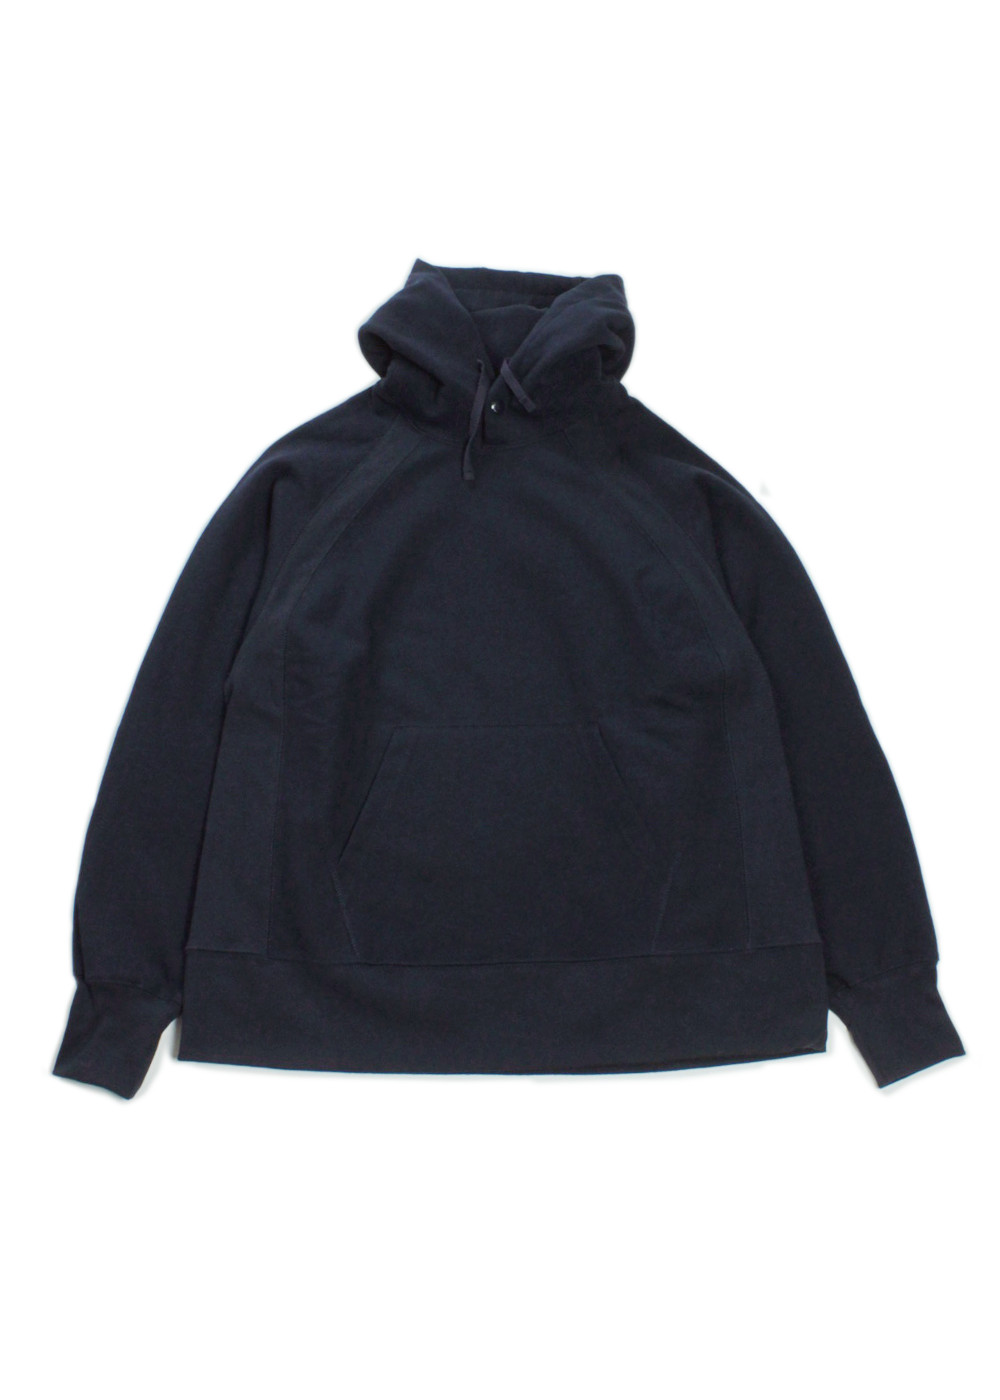 Engineered-Garments-Plain-Raglan-Hoody-Navy-01